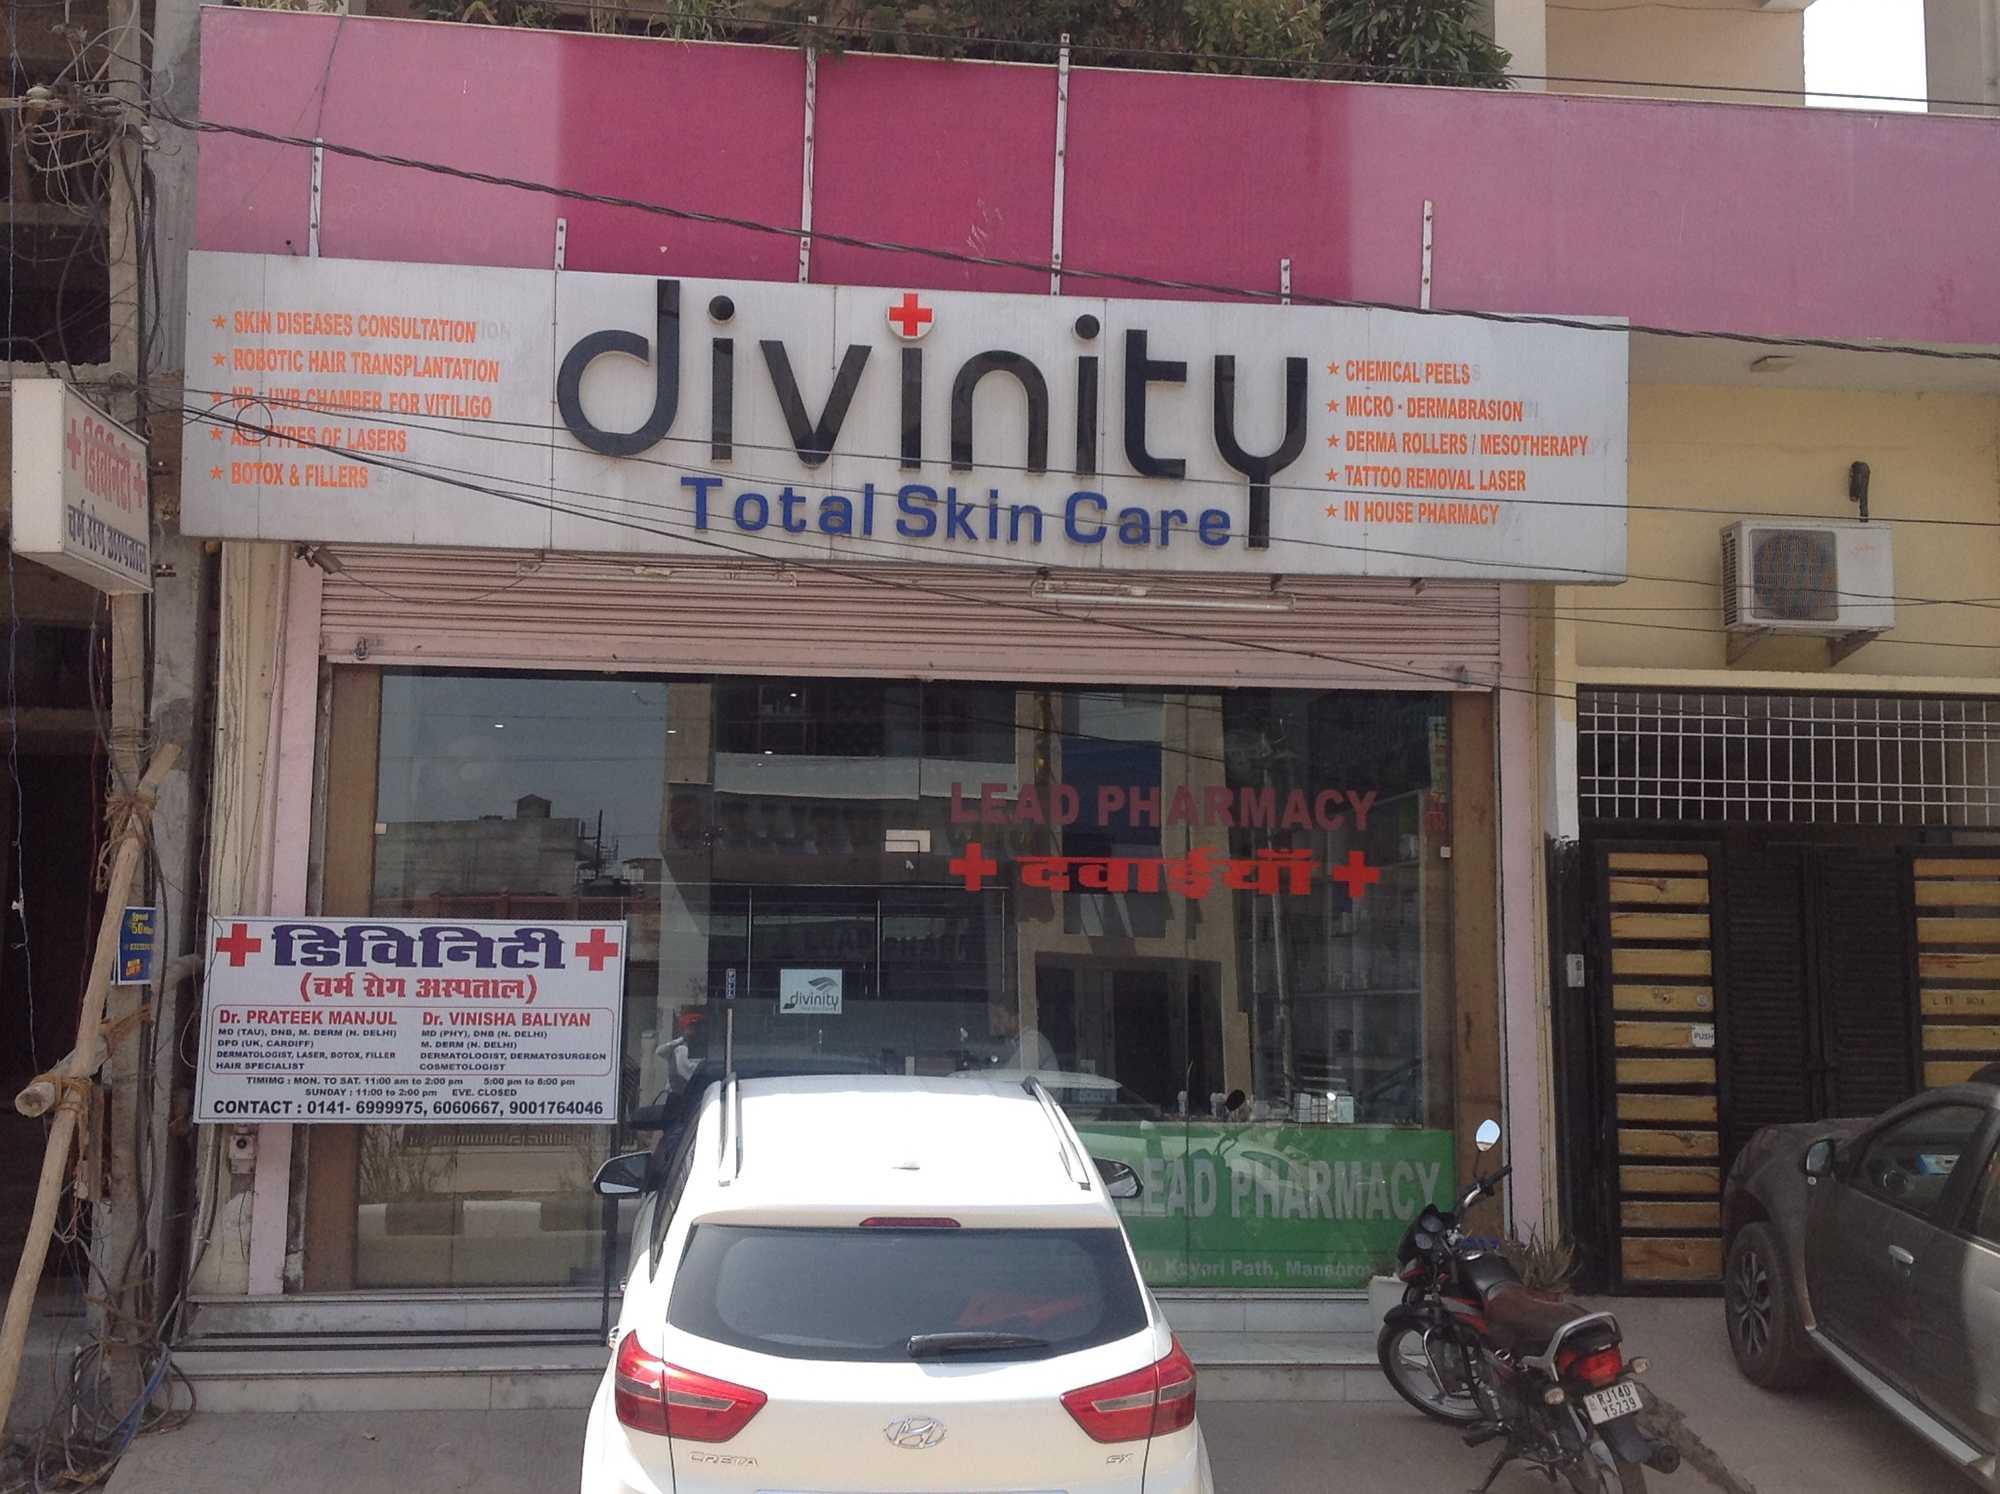 Top 30 Skin Care Clinics in Jaipur GPO, Jaipur - Best Skin Clinics